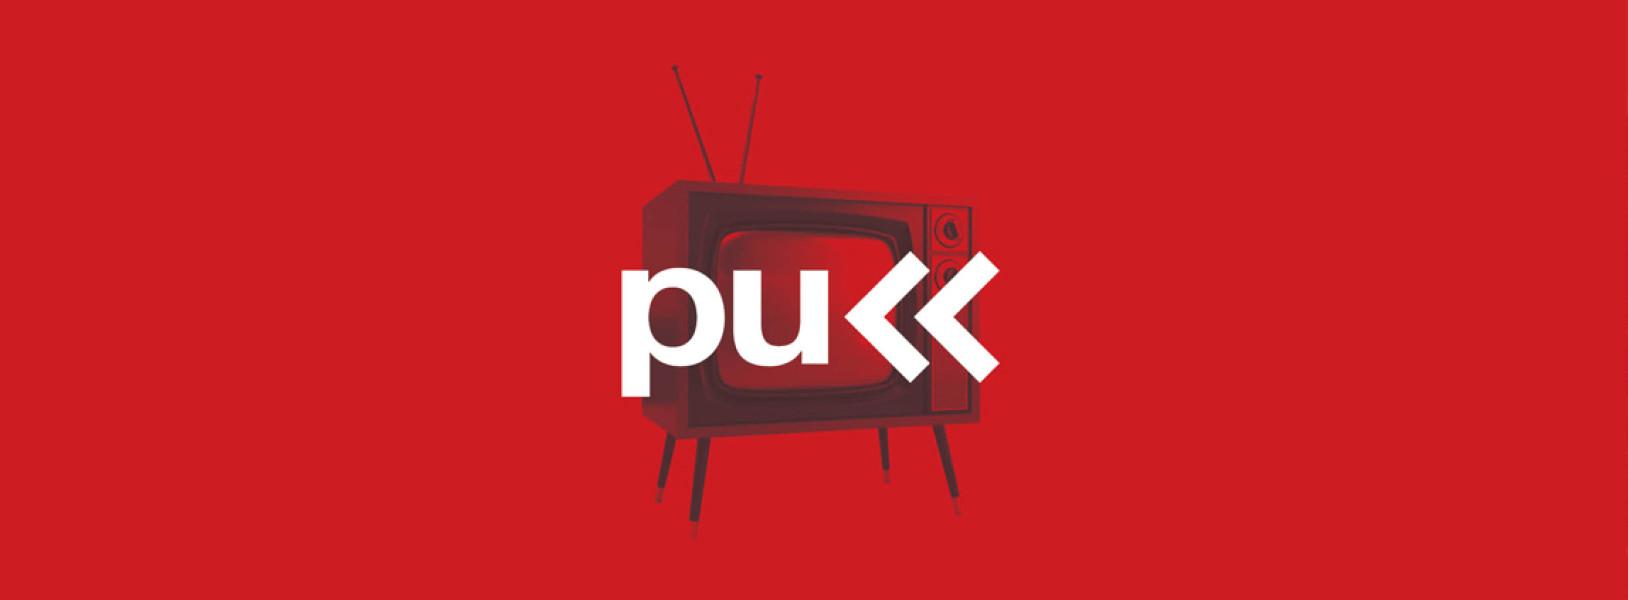 Pull: Case Study